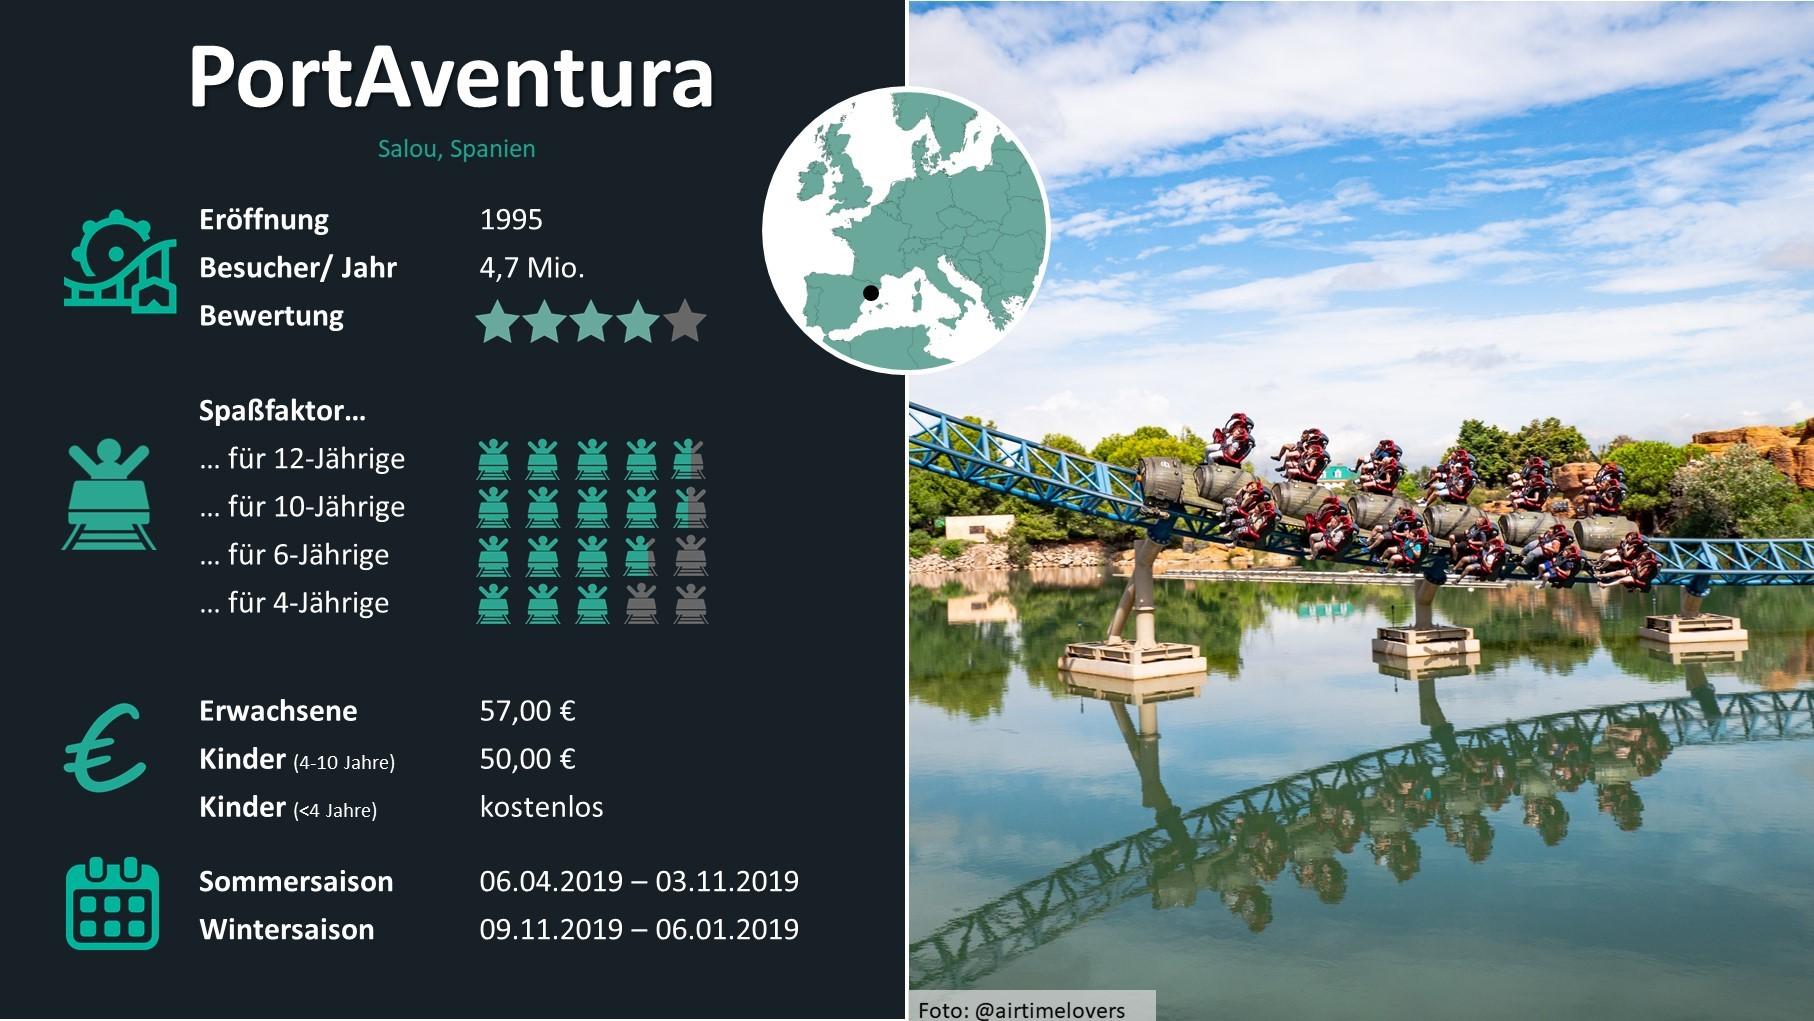 Freizeitpark Check: PortAventura